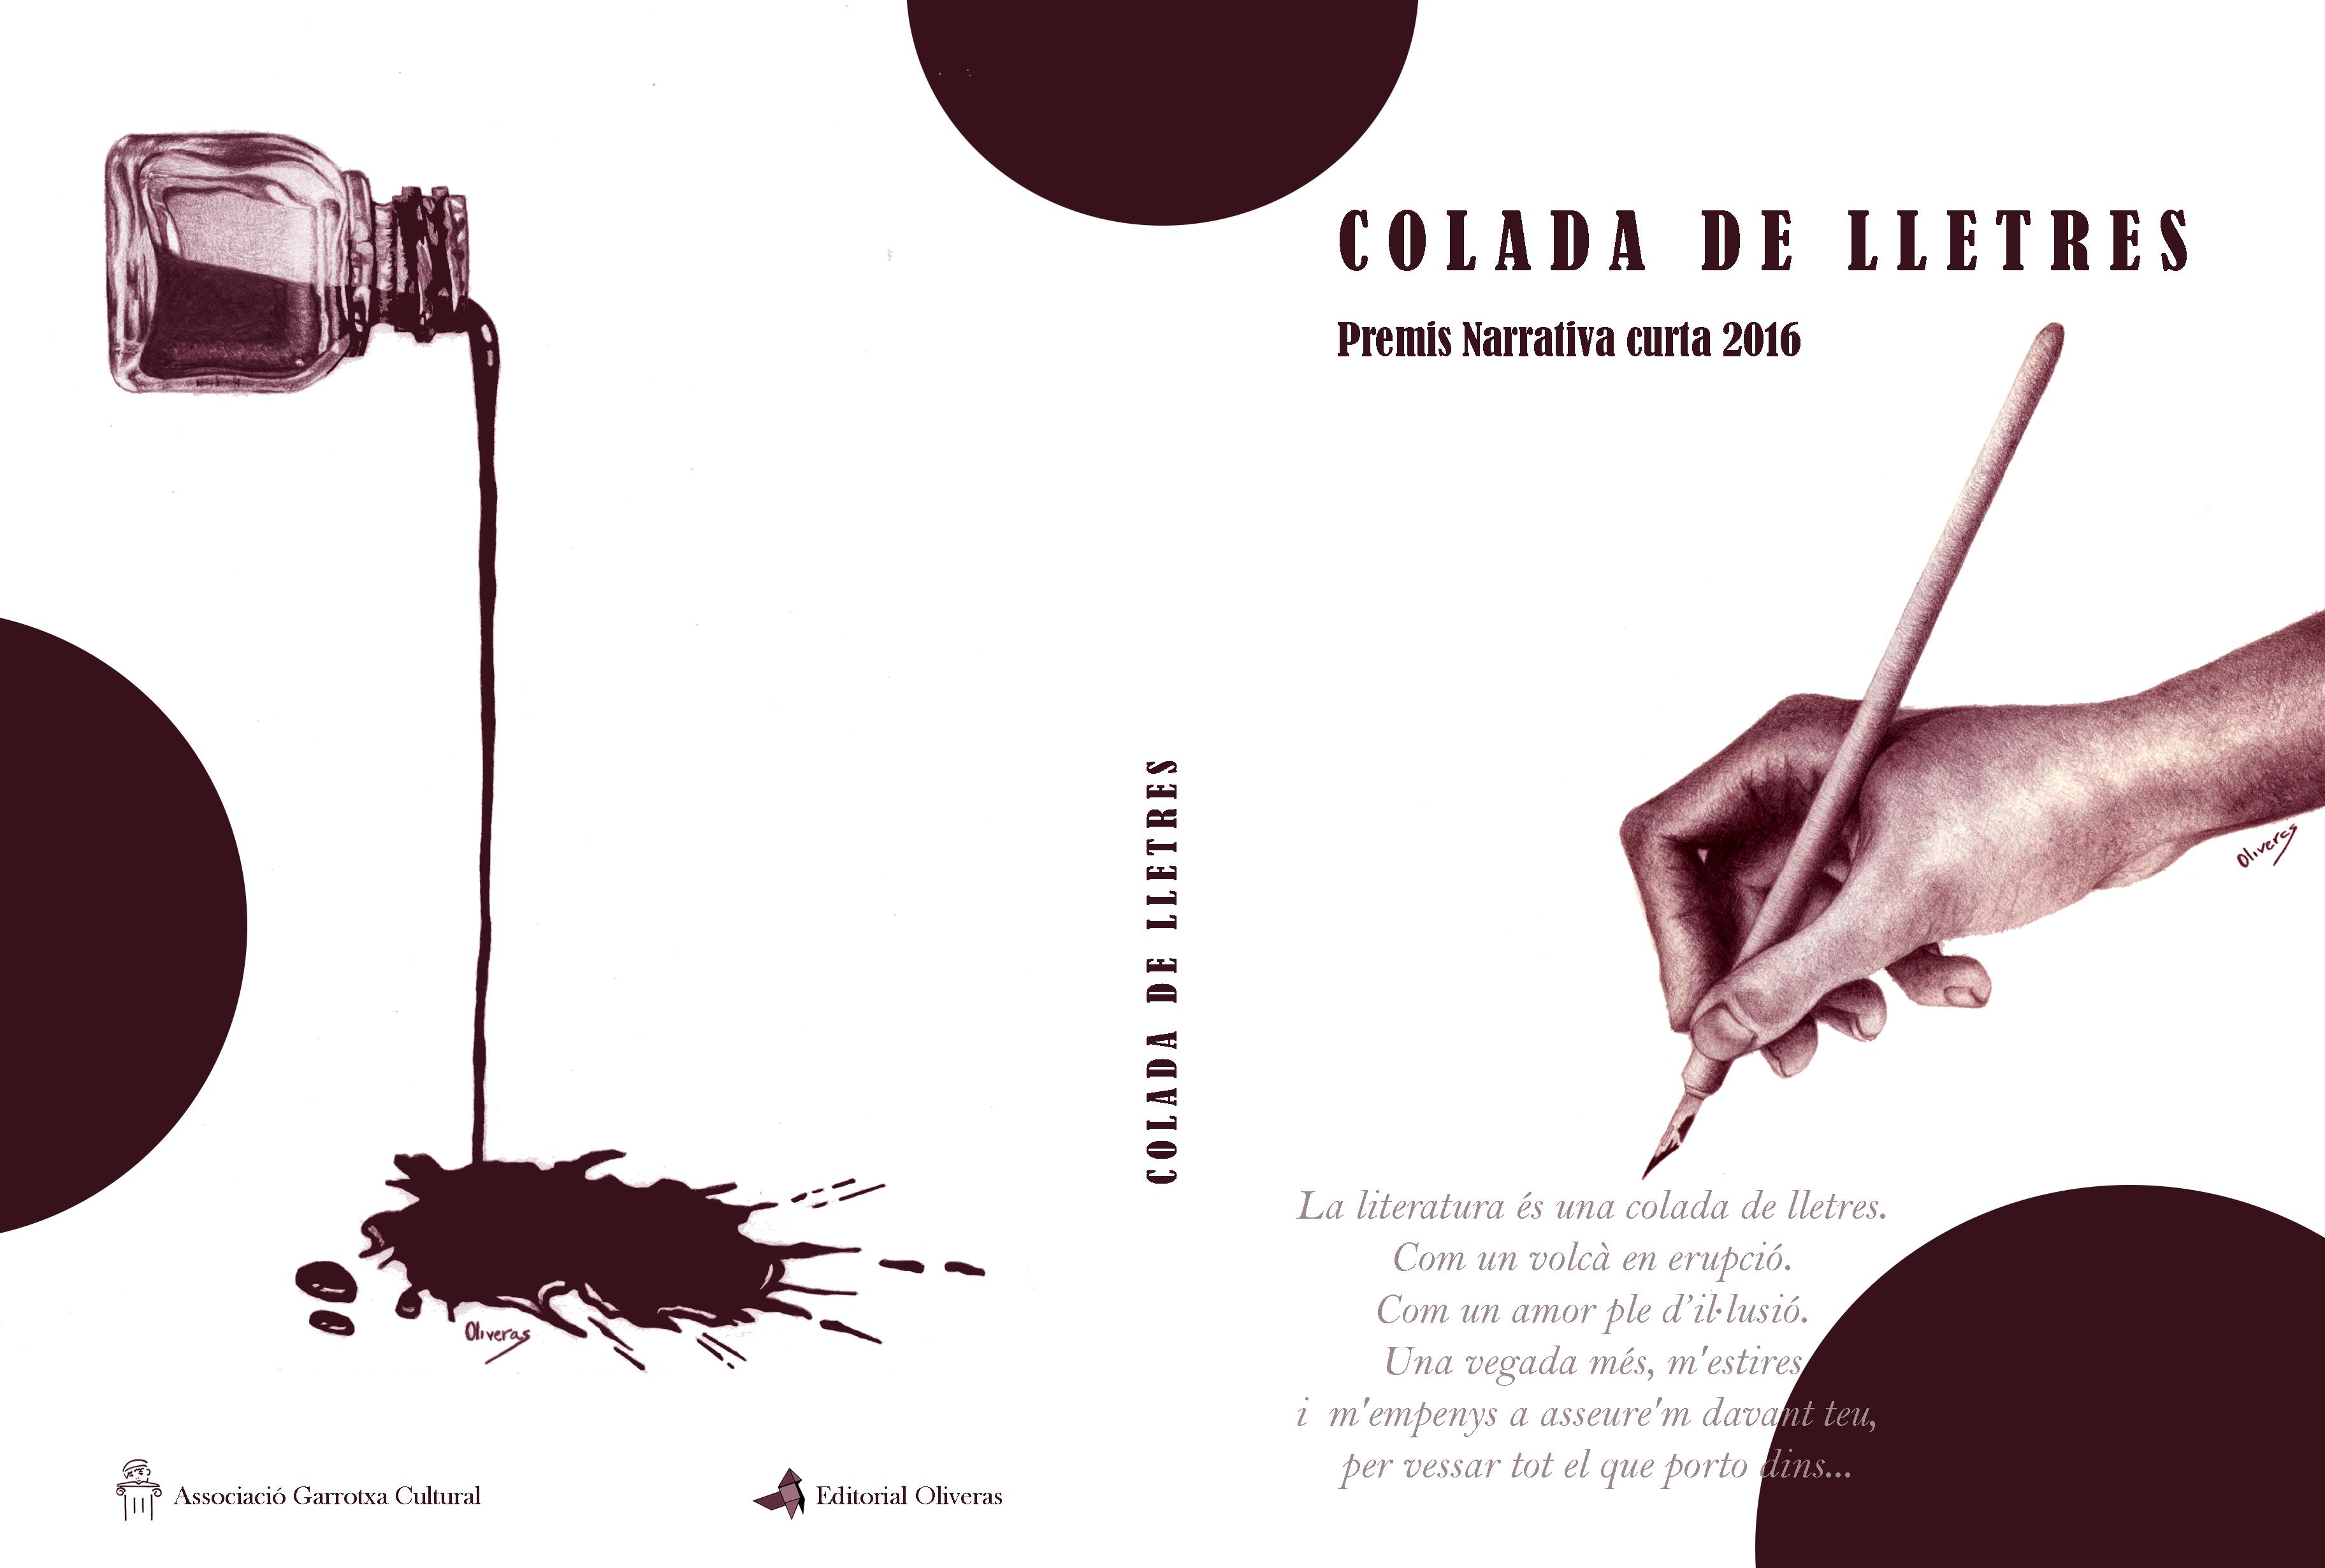 COLADA DE LLETRES